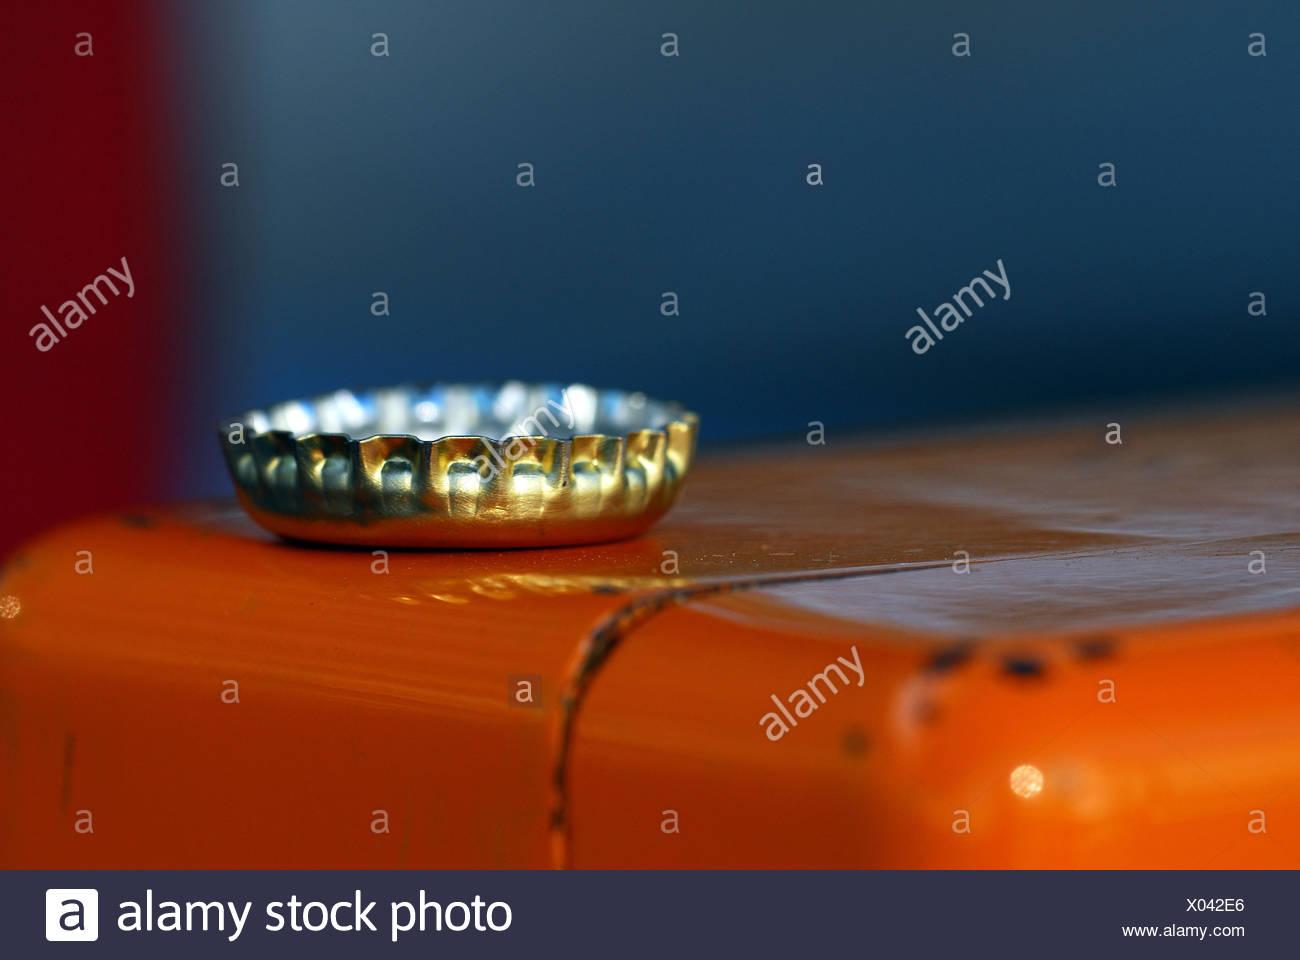 silver seal shutter mirrored huddled fasteners kronkorken flaschenverschluss - Stock Image